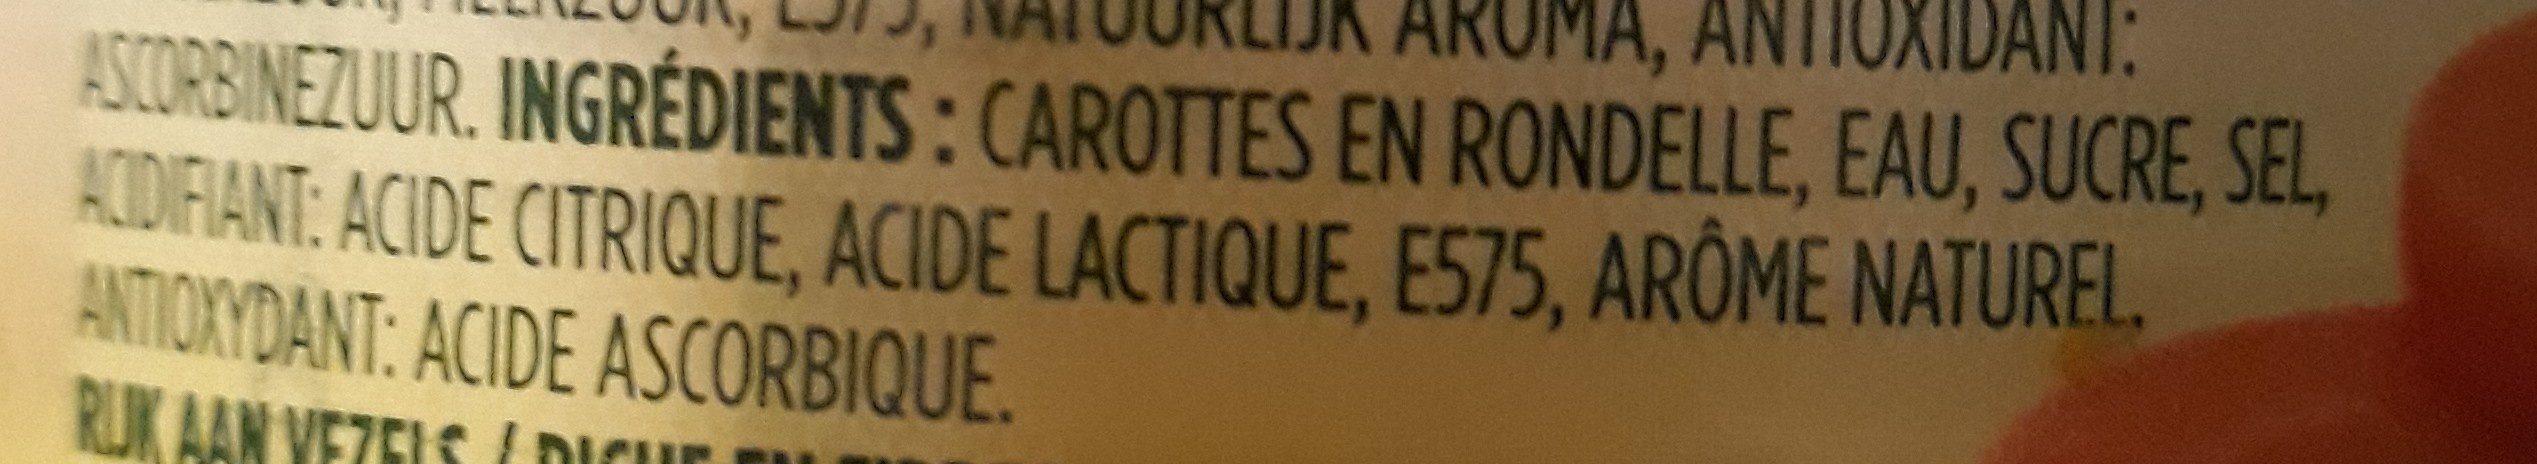 carottes rondelles - Ingrédients - fr